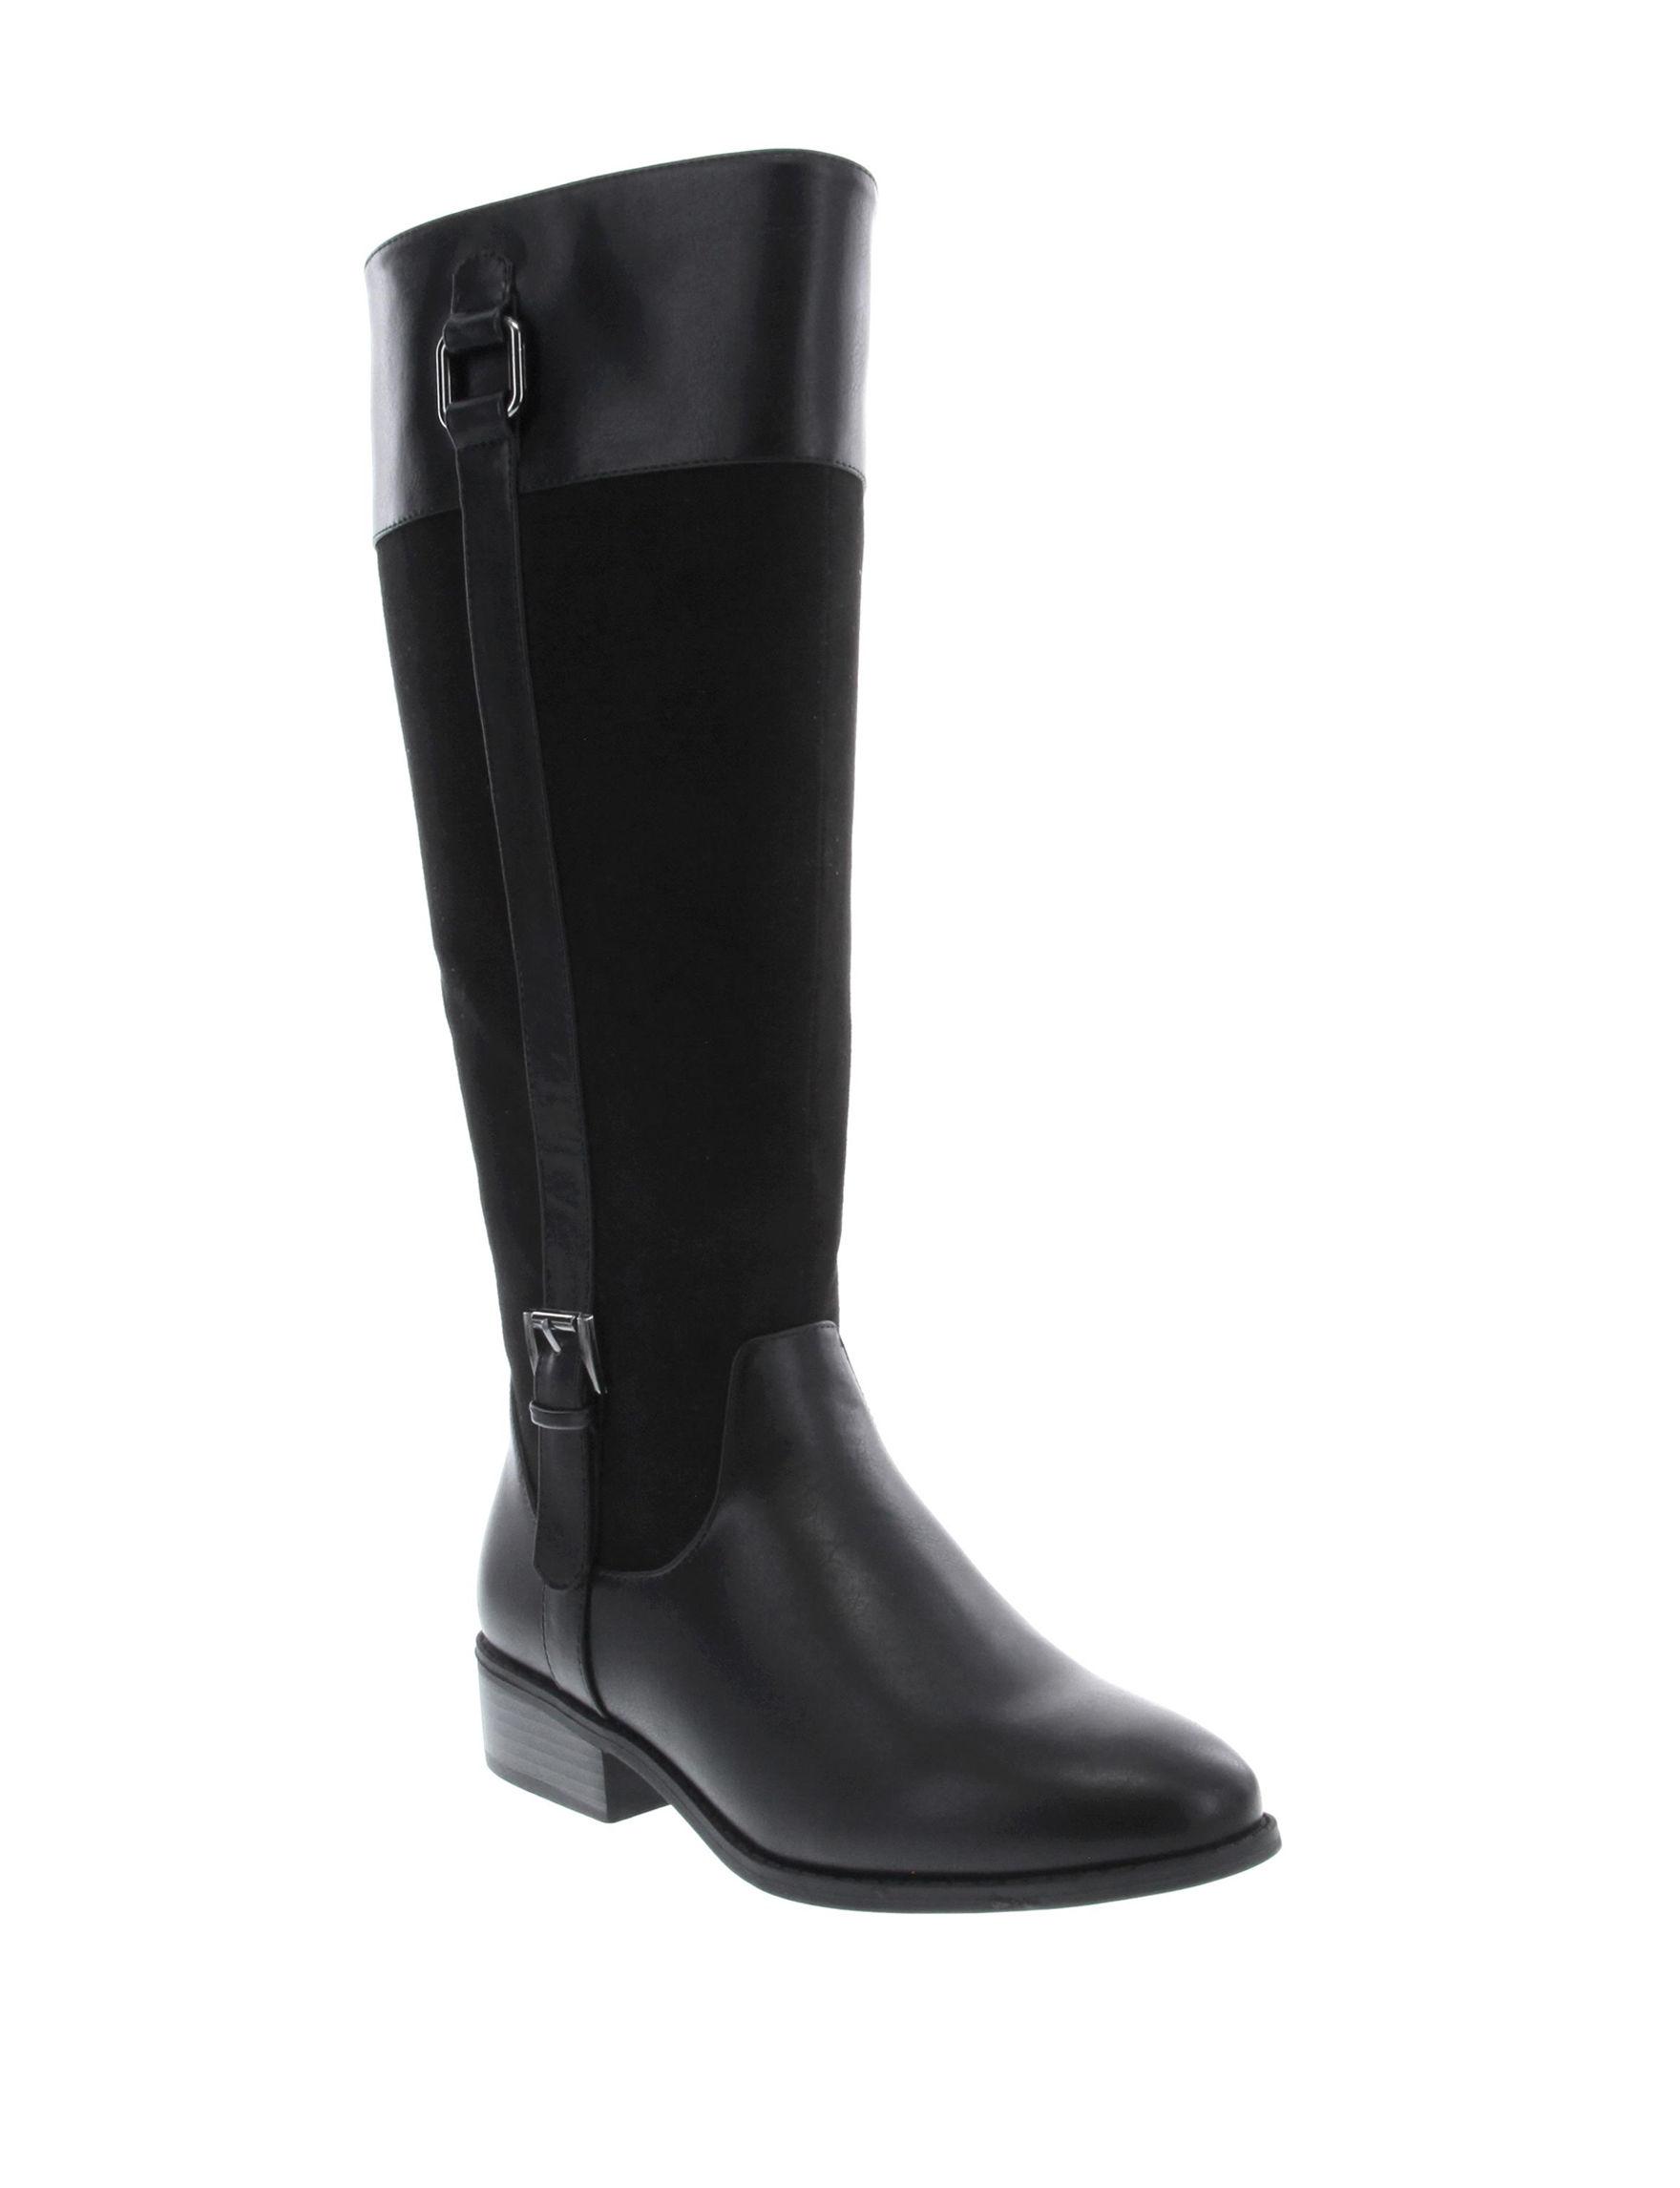 London Fog Black Riding Boots Wide Calf